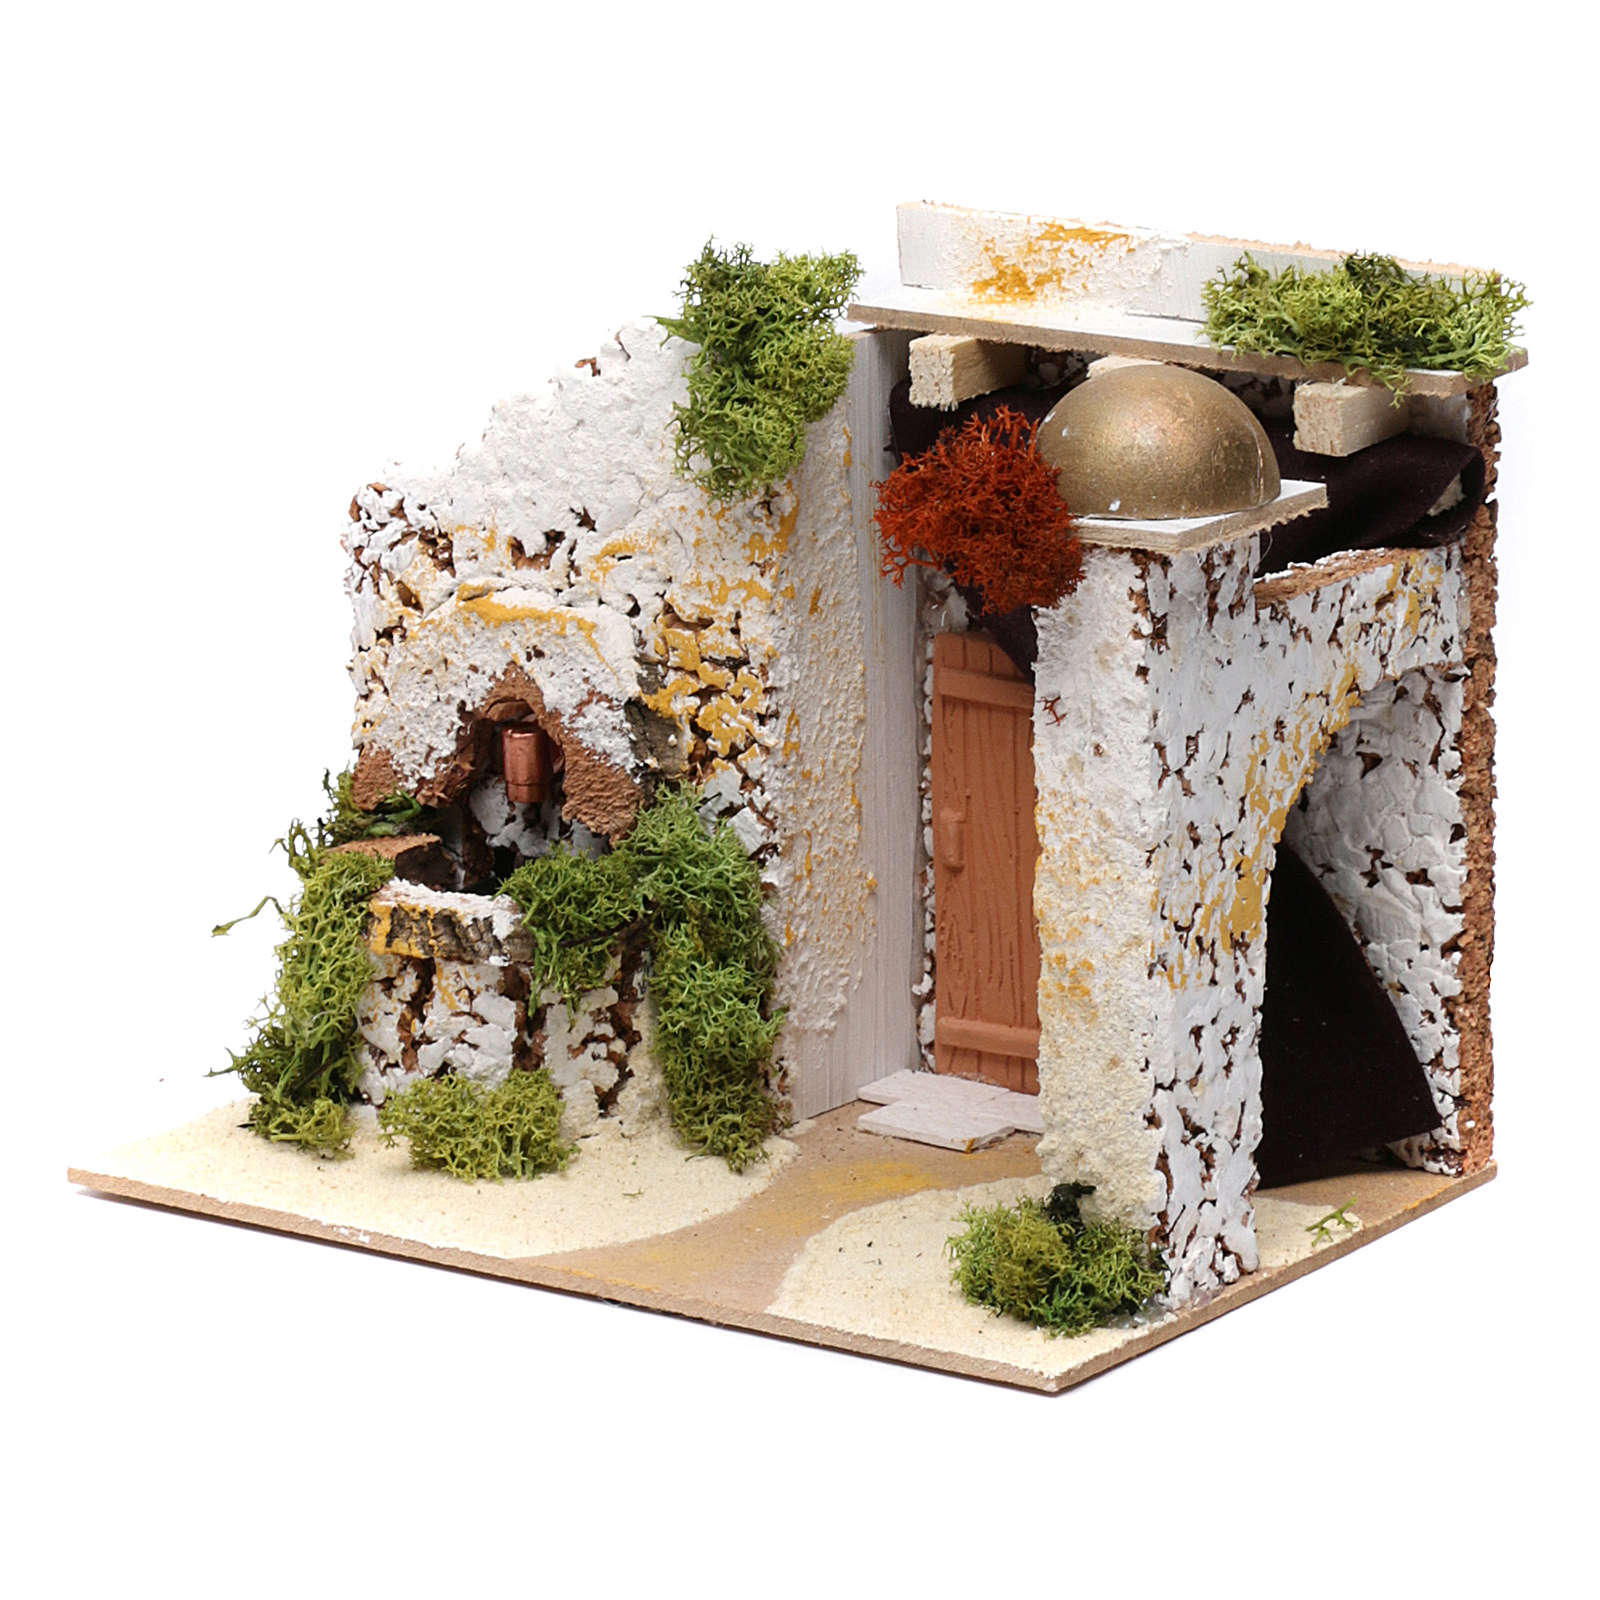 Arab style house with fountain 15x20x15 cm 4